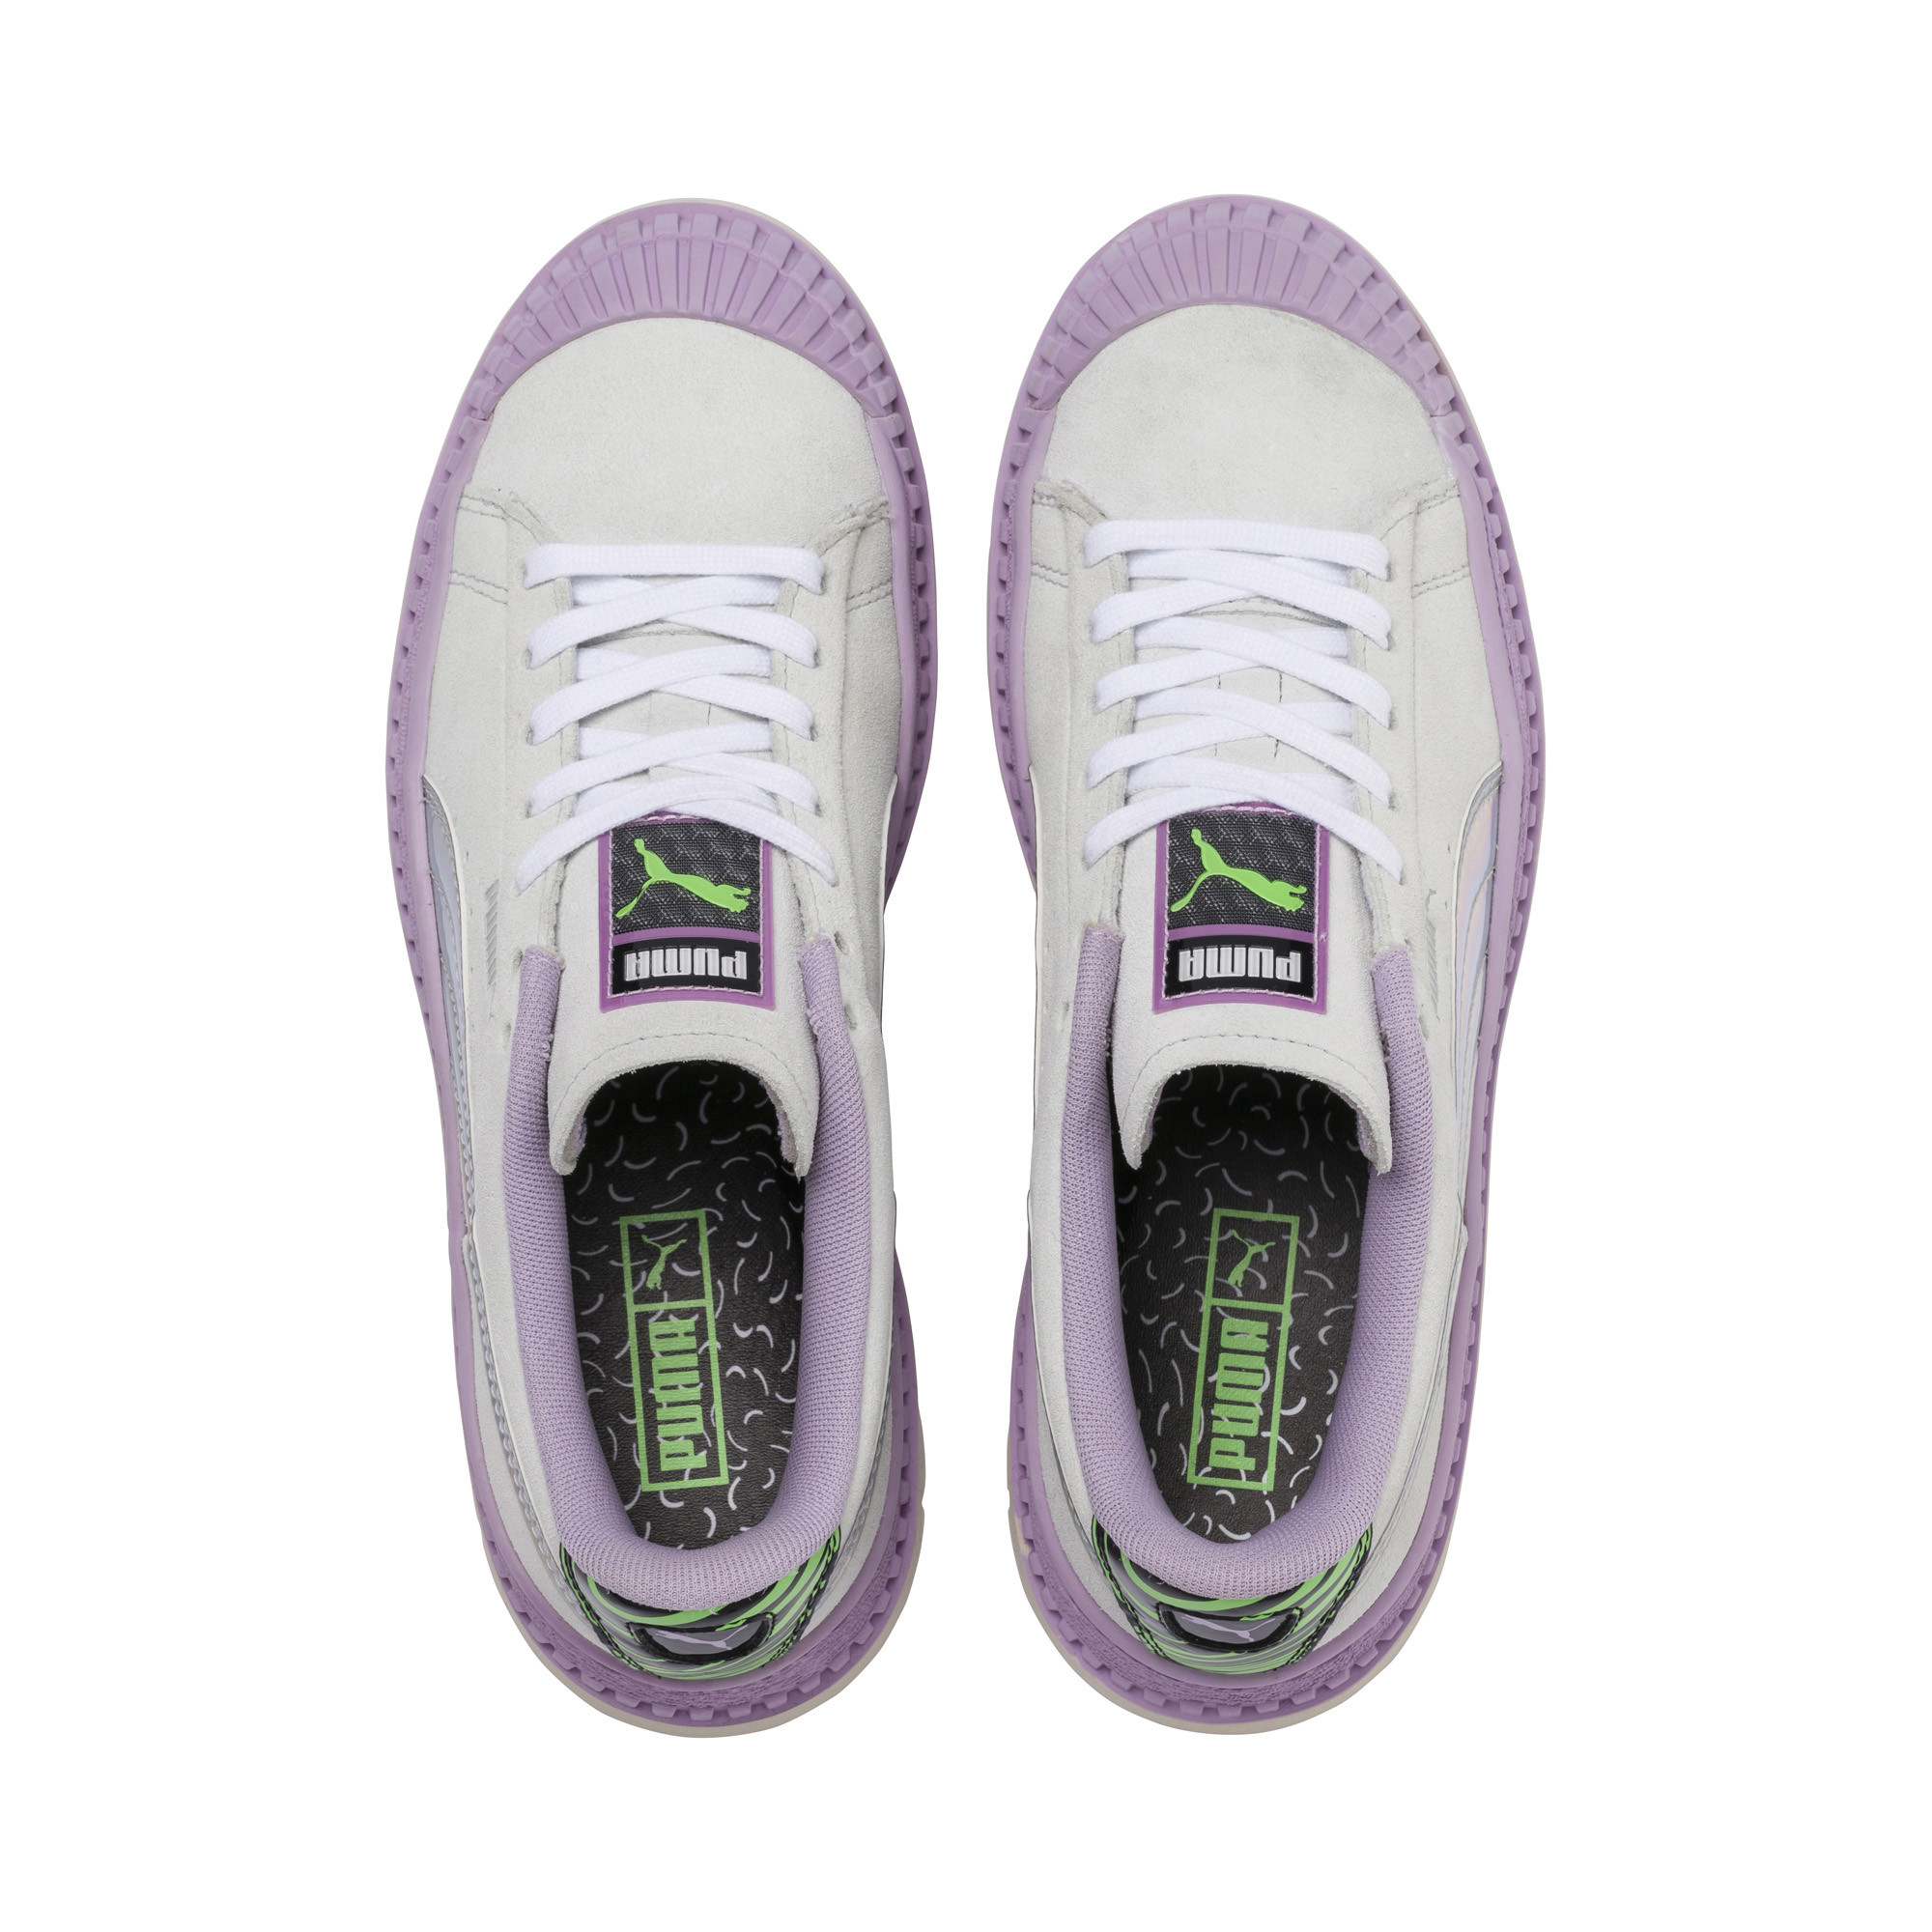 PUMA-Women-039-s-Utility-Dimension-Sneakers thumbnail 7